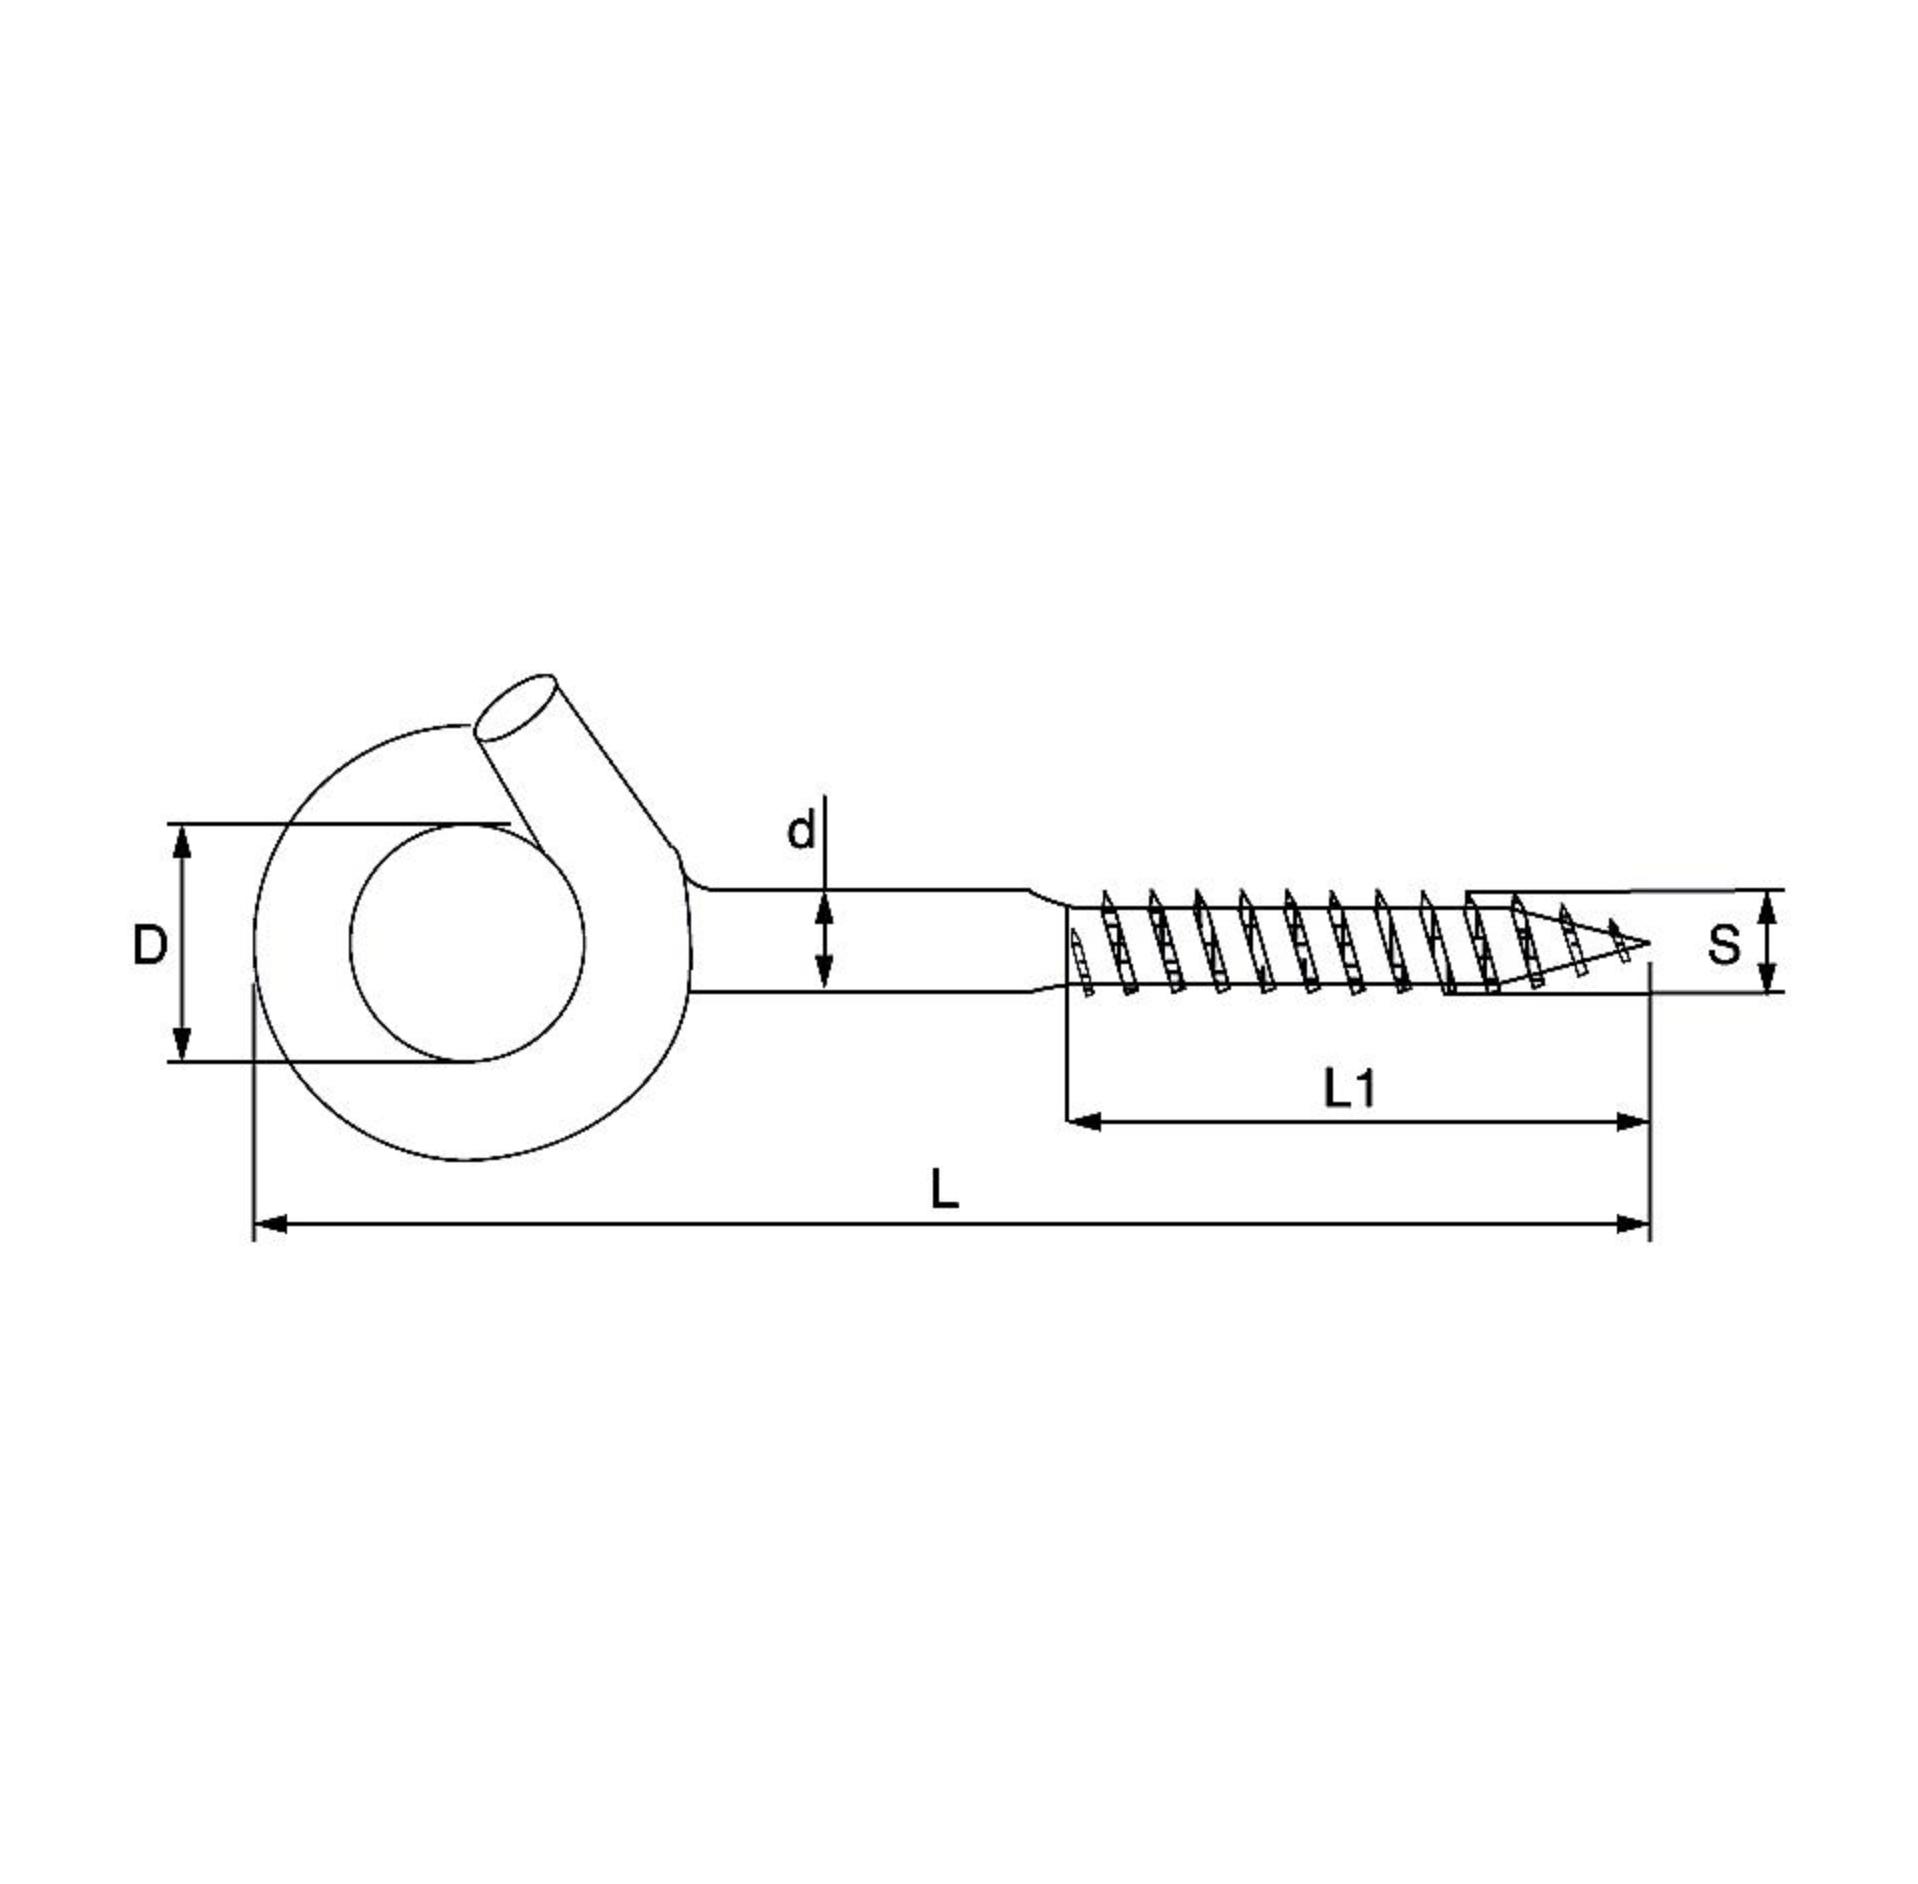 Dulimex Dulimex schommelhaak - bevestigingshaak M10x145 mm - houtdraad - verzinkt - 370-09E